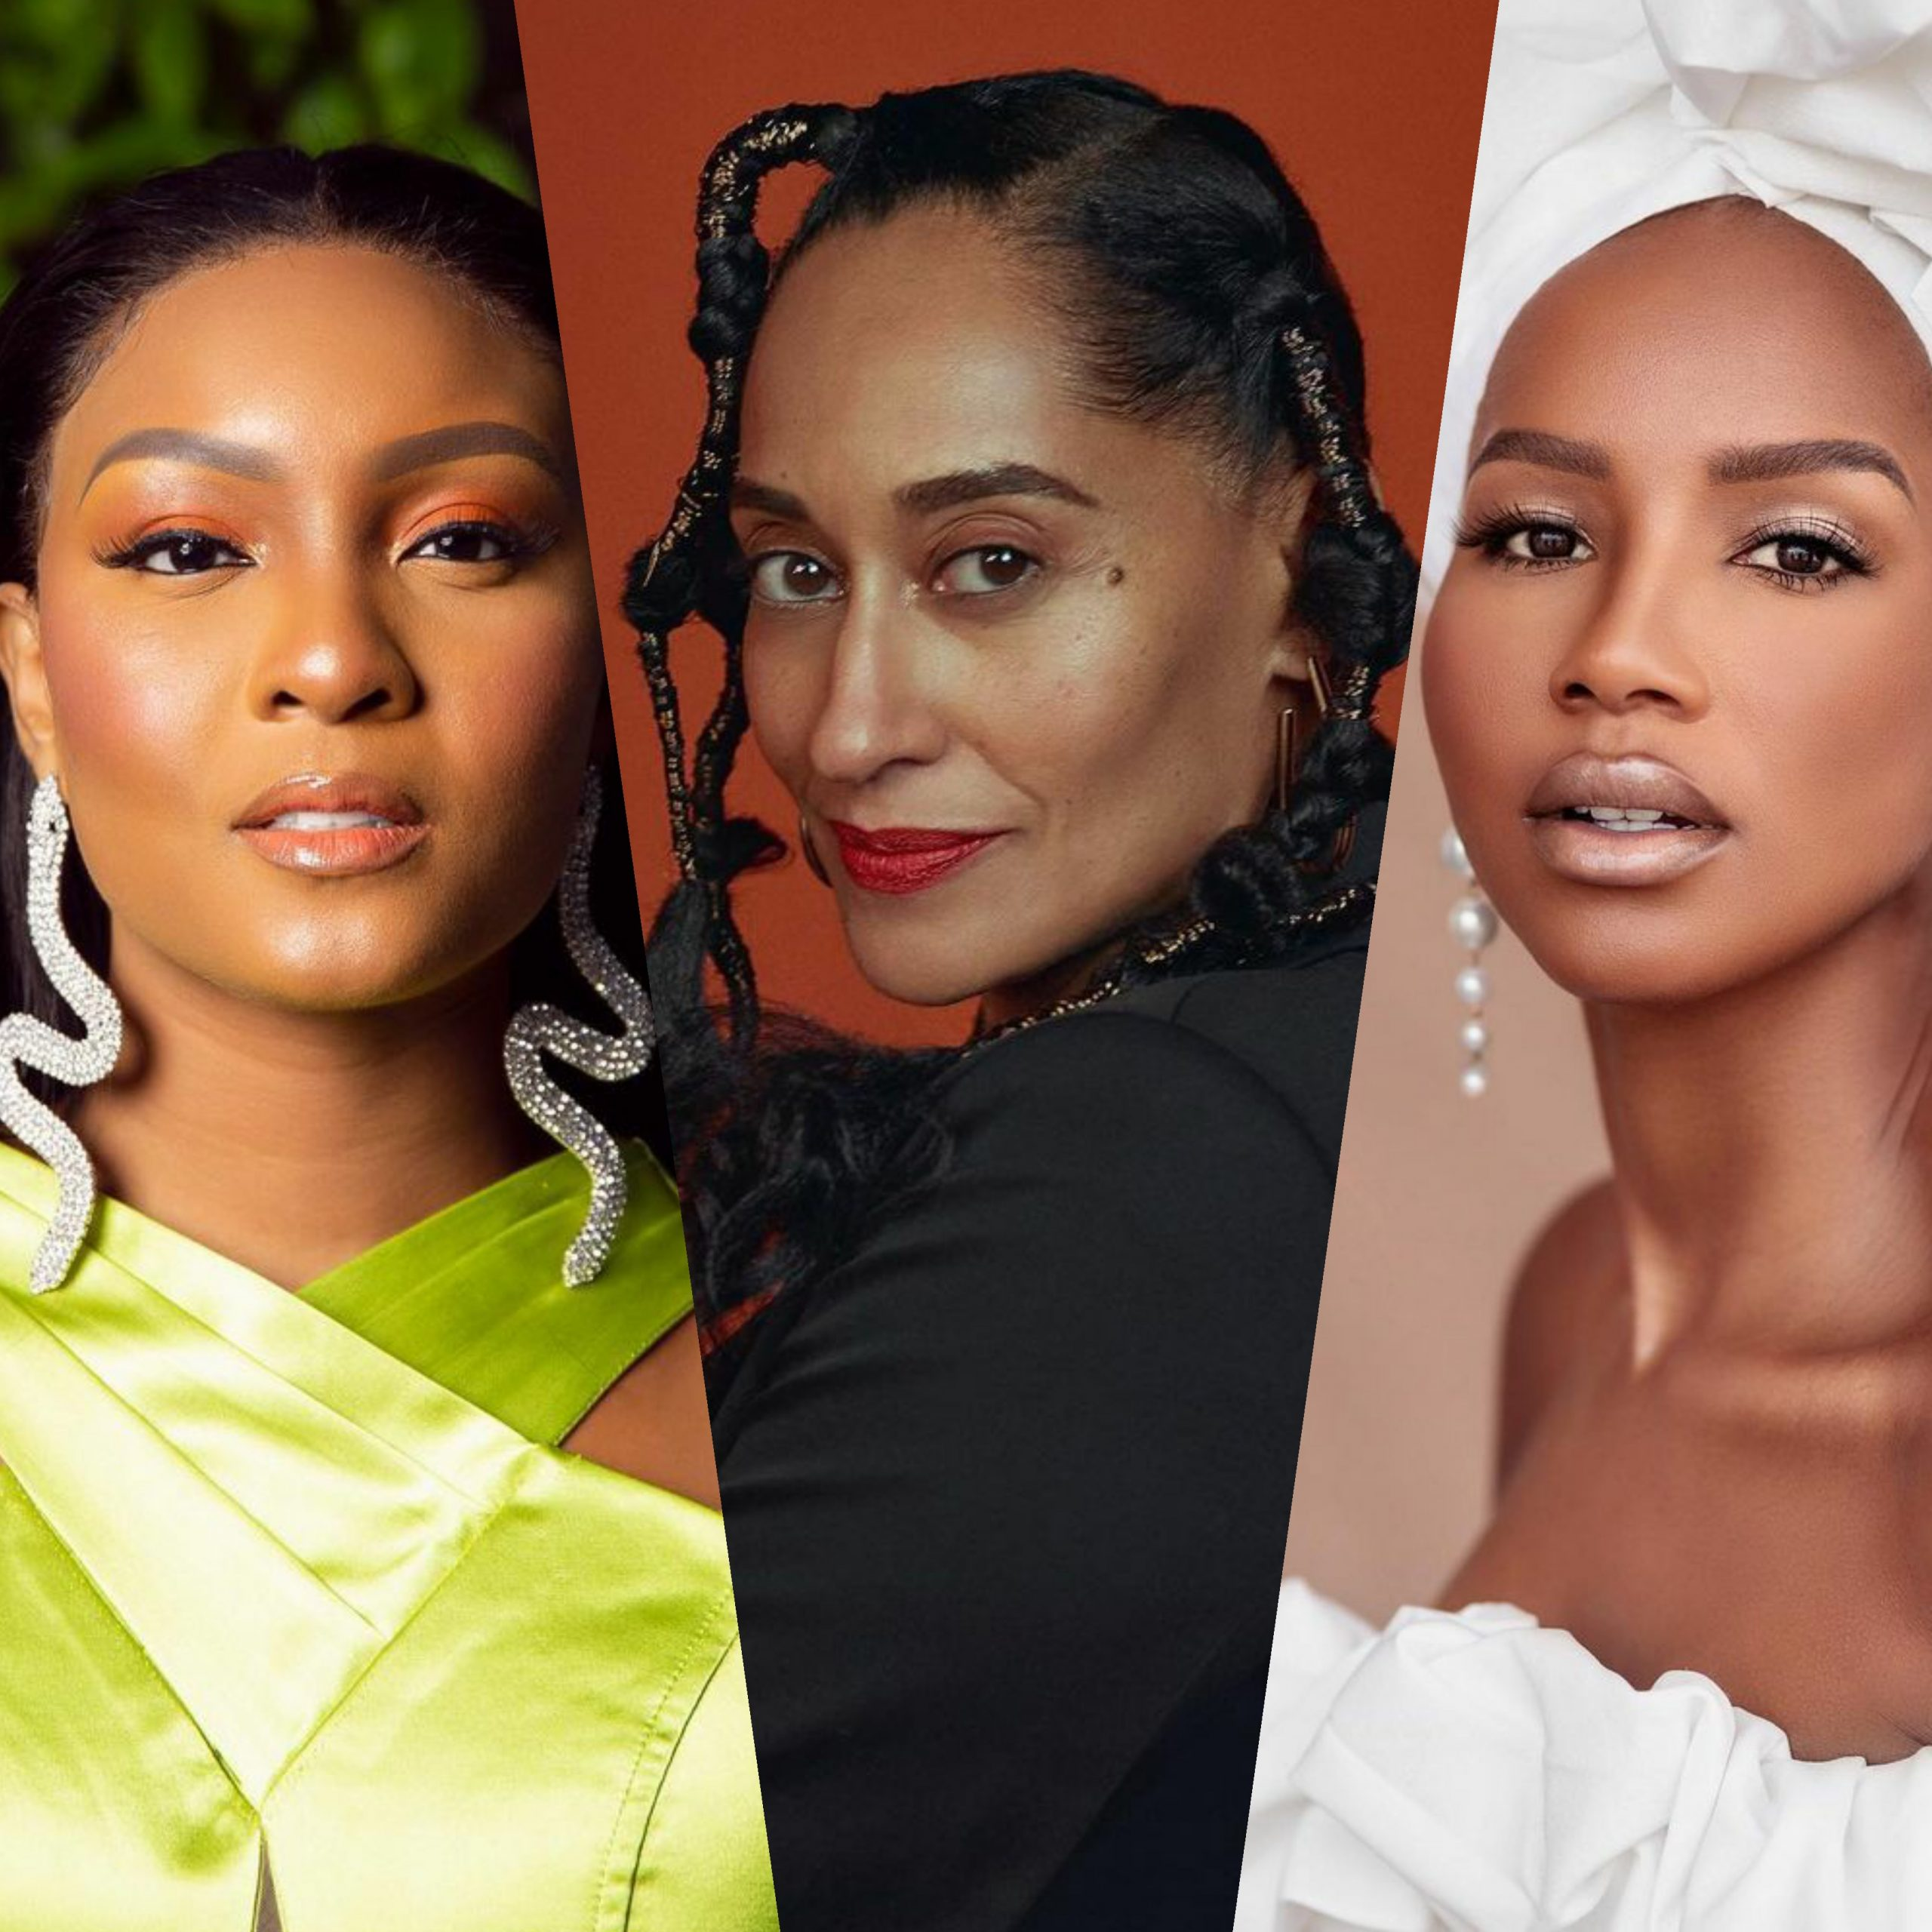 sophisticated-glam-beauty-looks-black-women